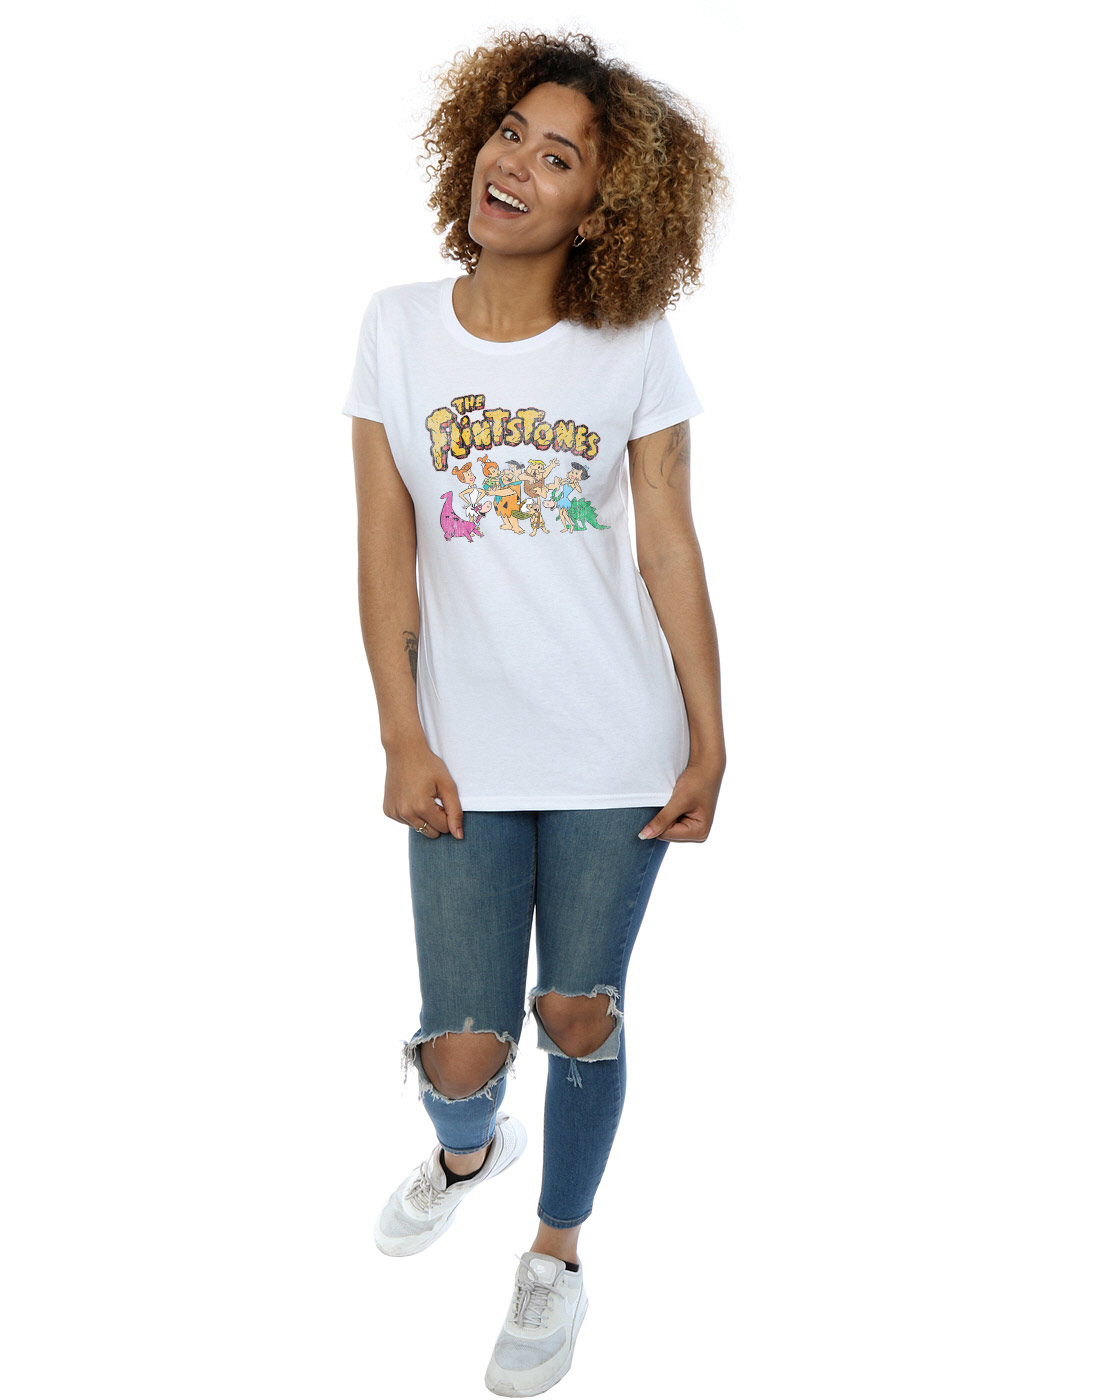 The-Flintstones-Women-039-s-Group-Distressed-T-Shirt thumbnail 20